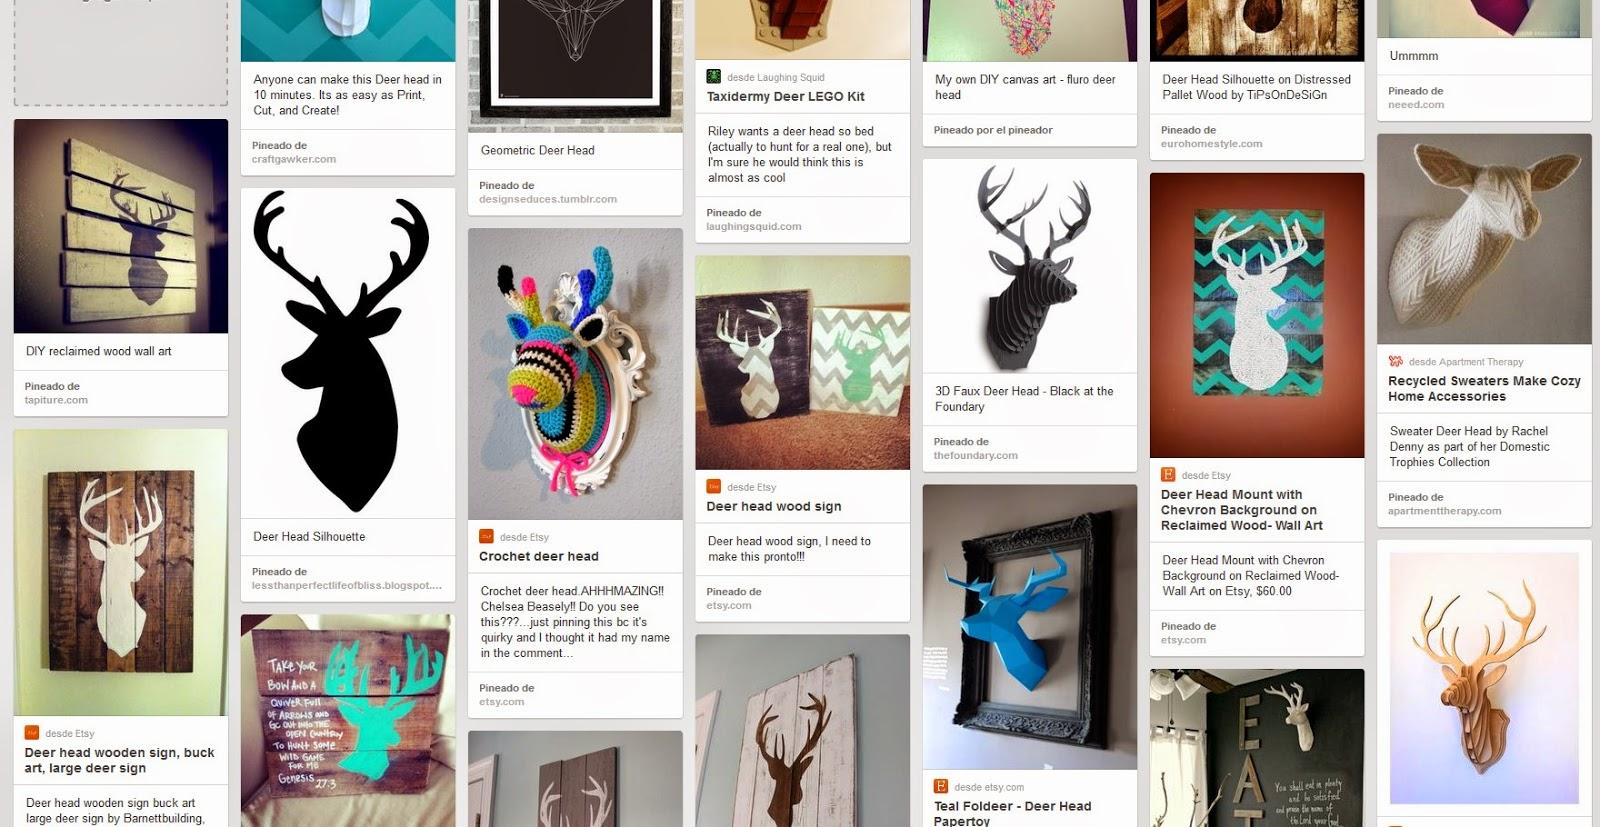 http://www.pinterest.com/eleojota/deer-head/